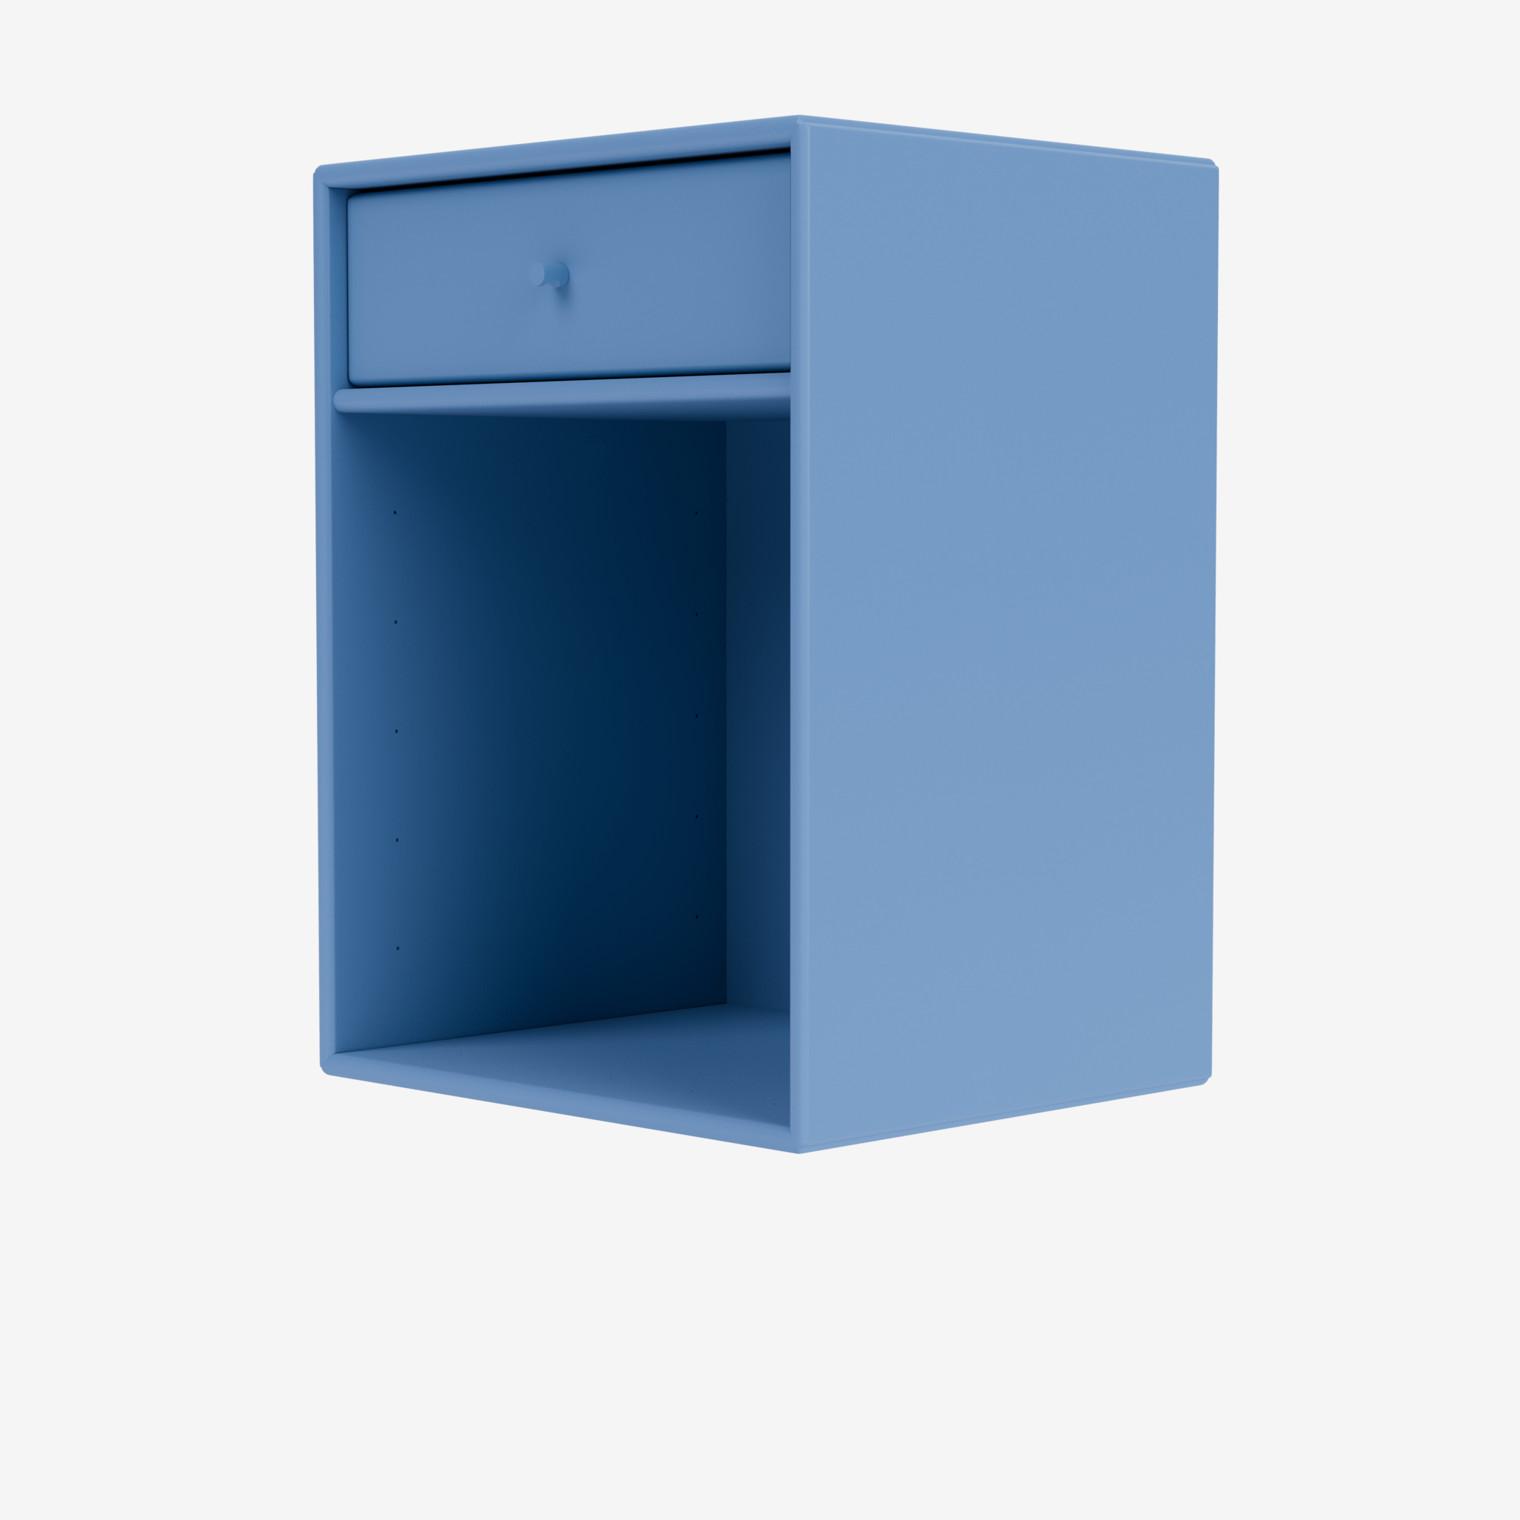 Shelf 4262